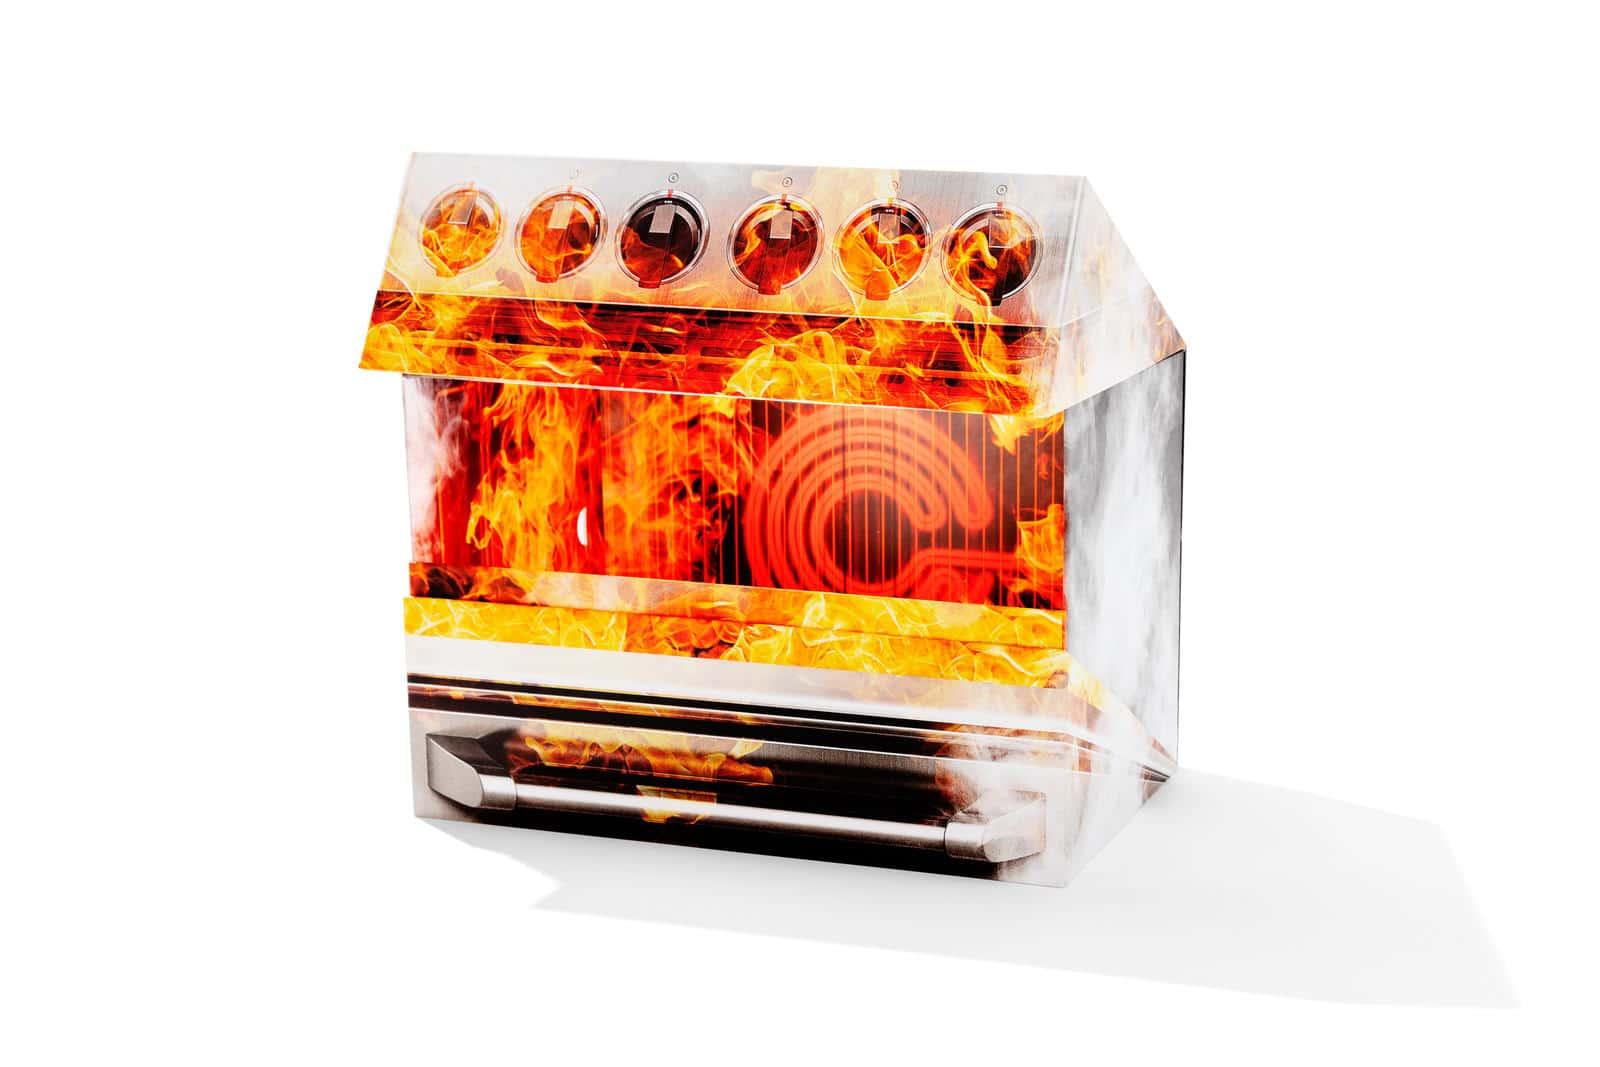 Коробка в форме духовки